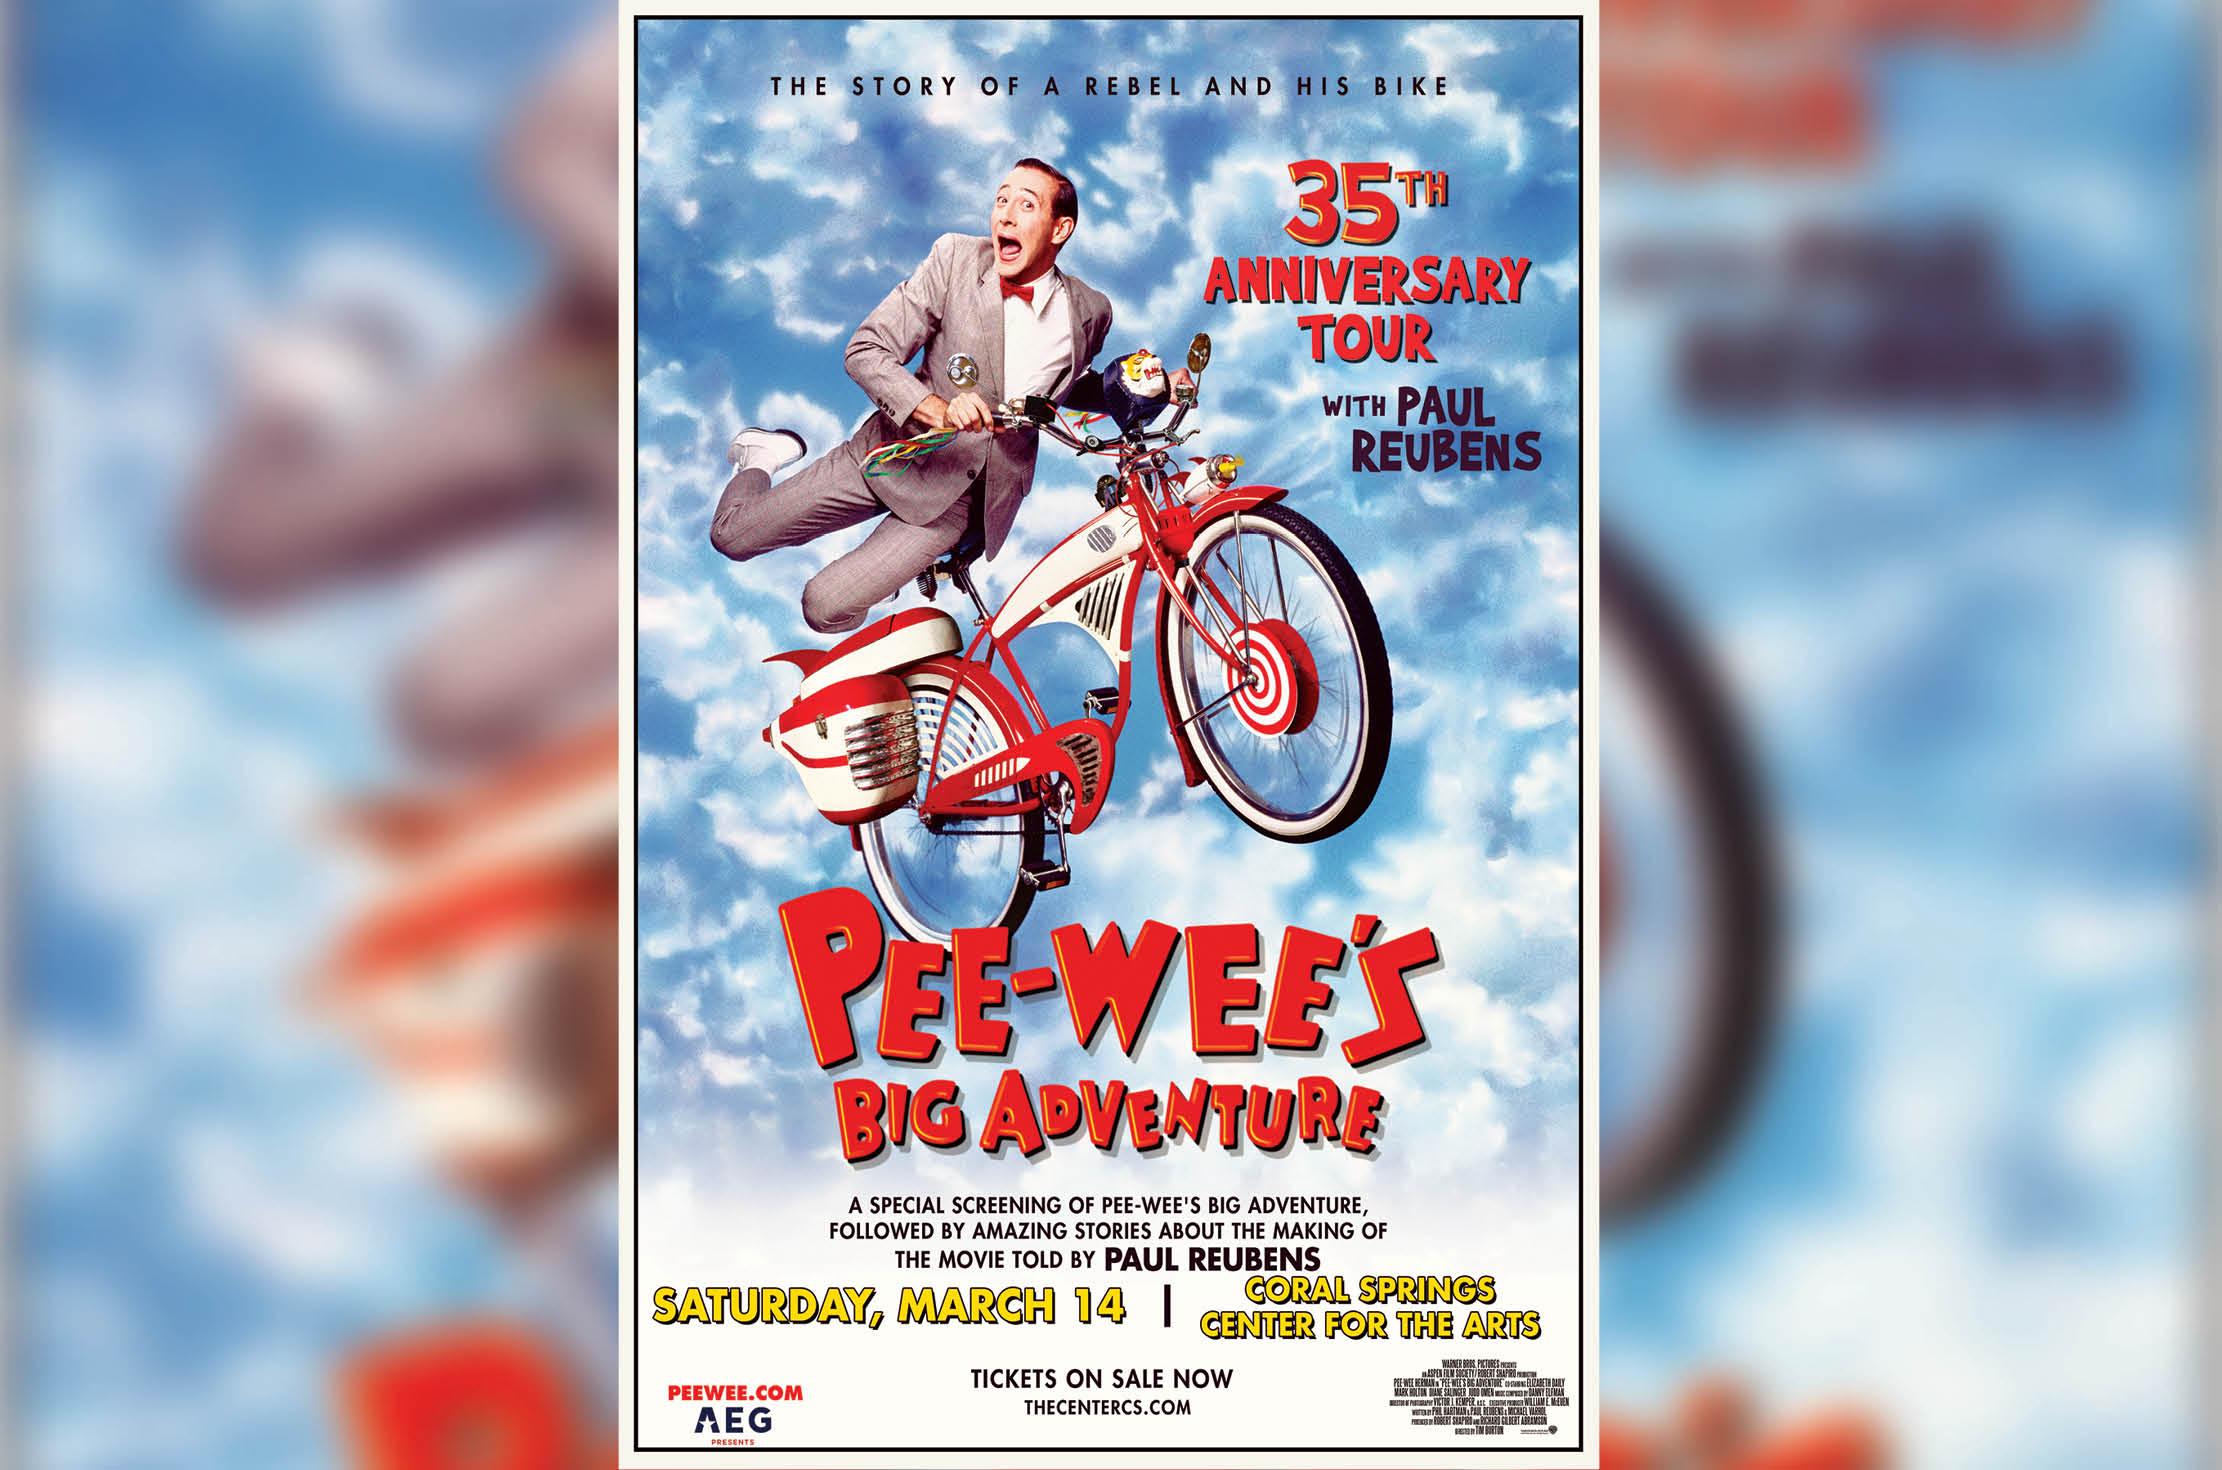 Paul Reubens to Headline 35th Anniversary of Pee-Wee's Big Adventure